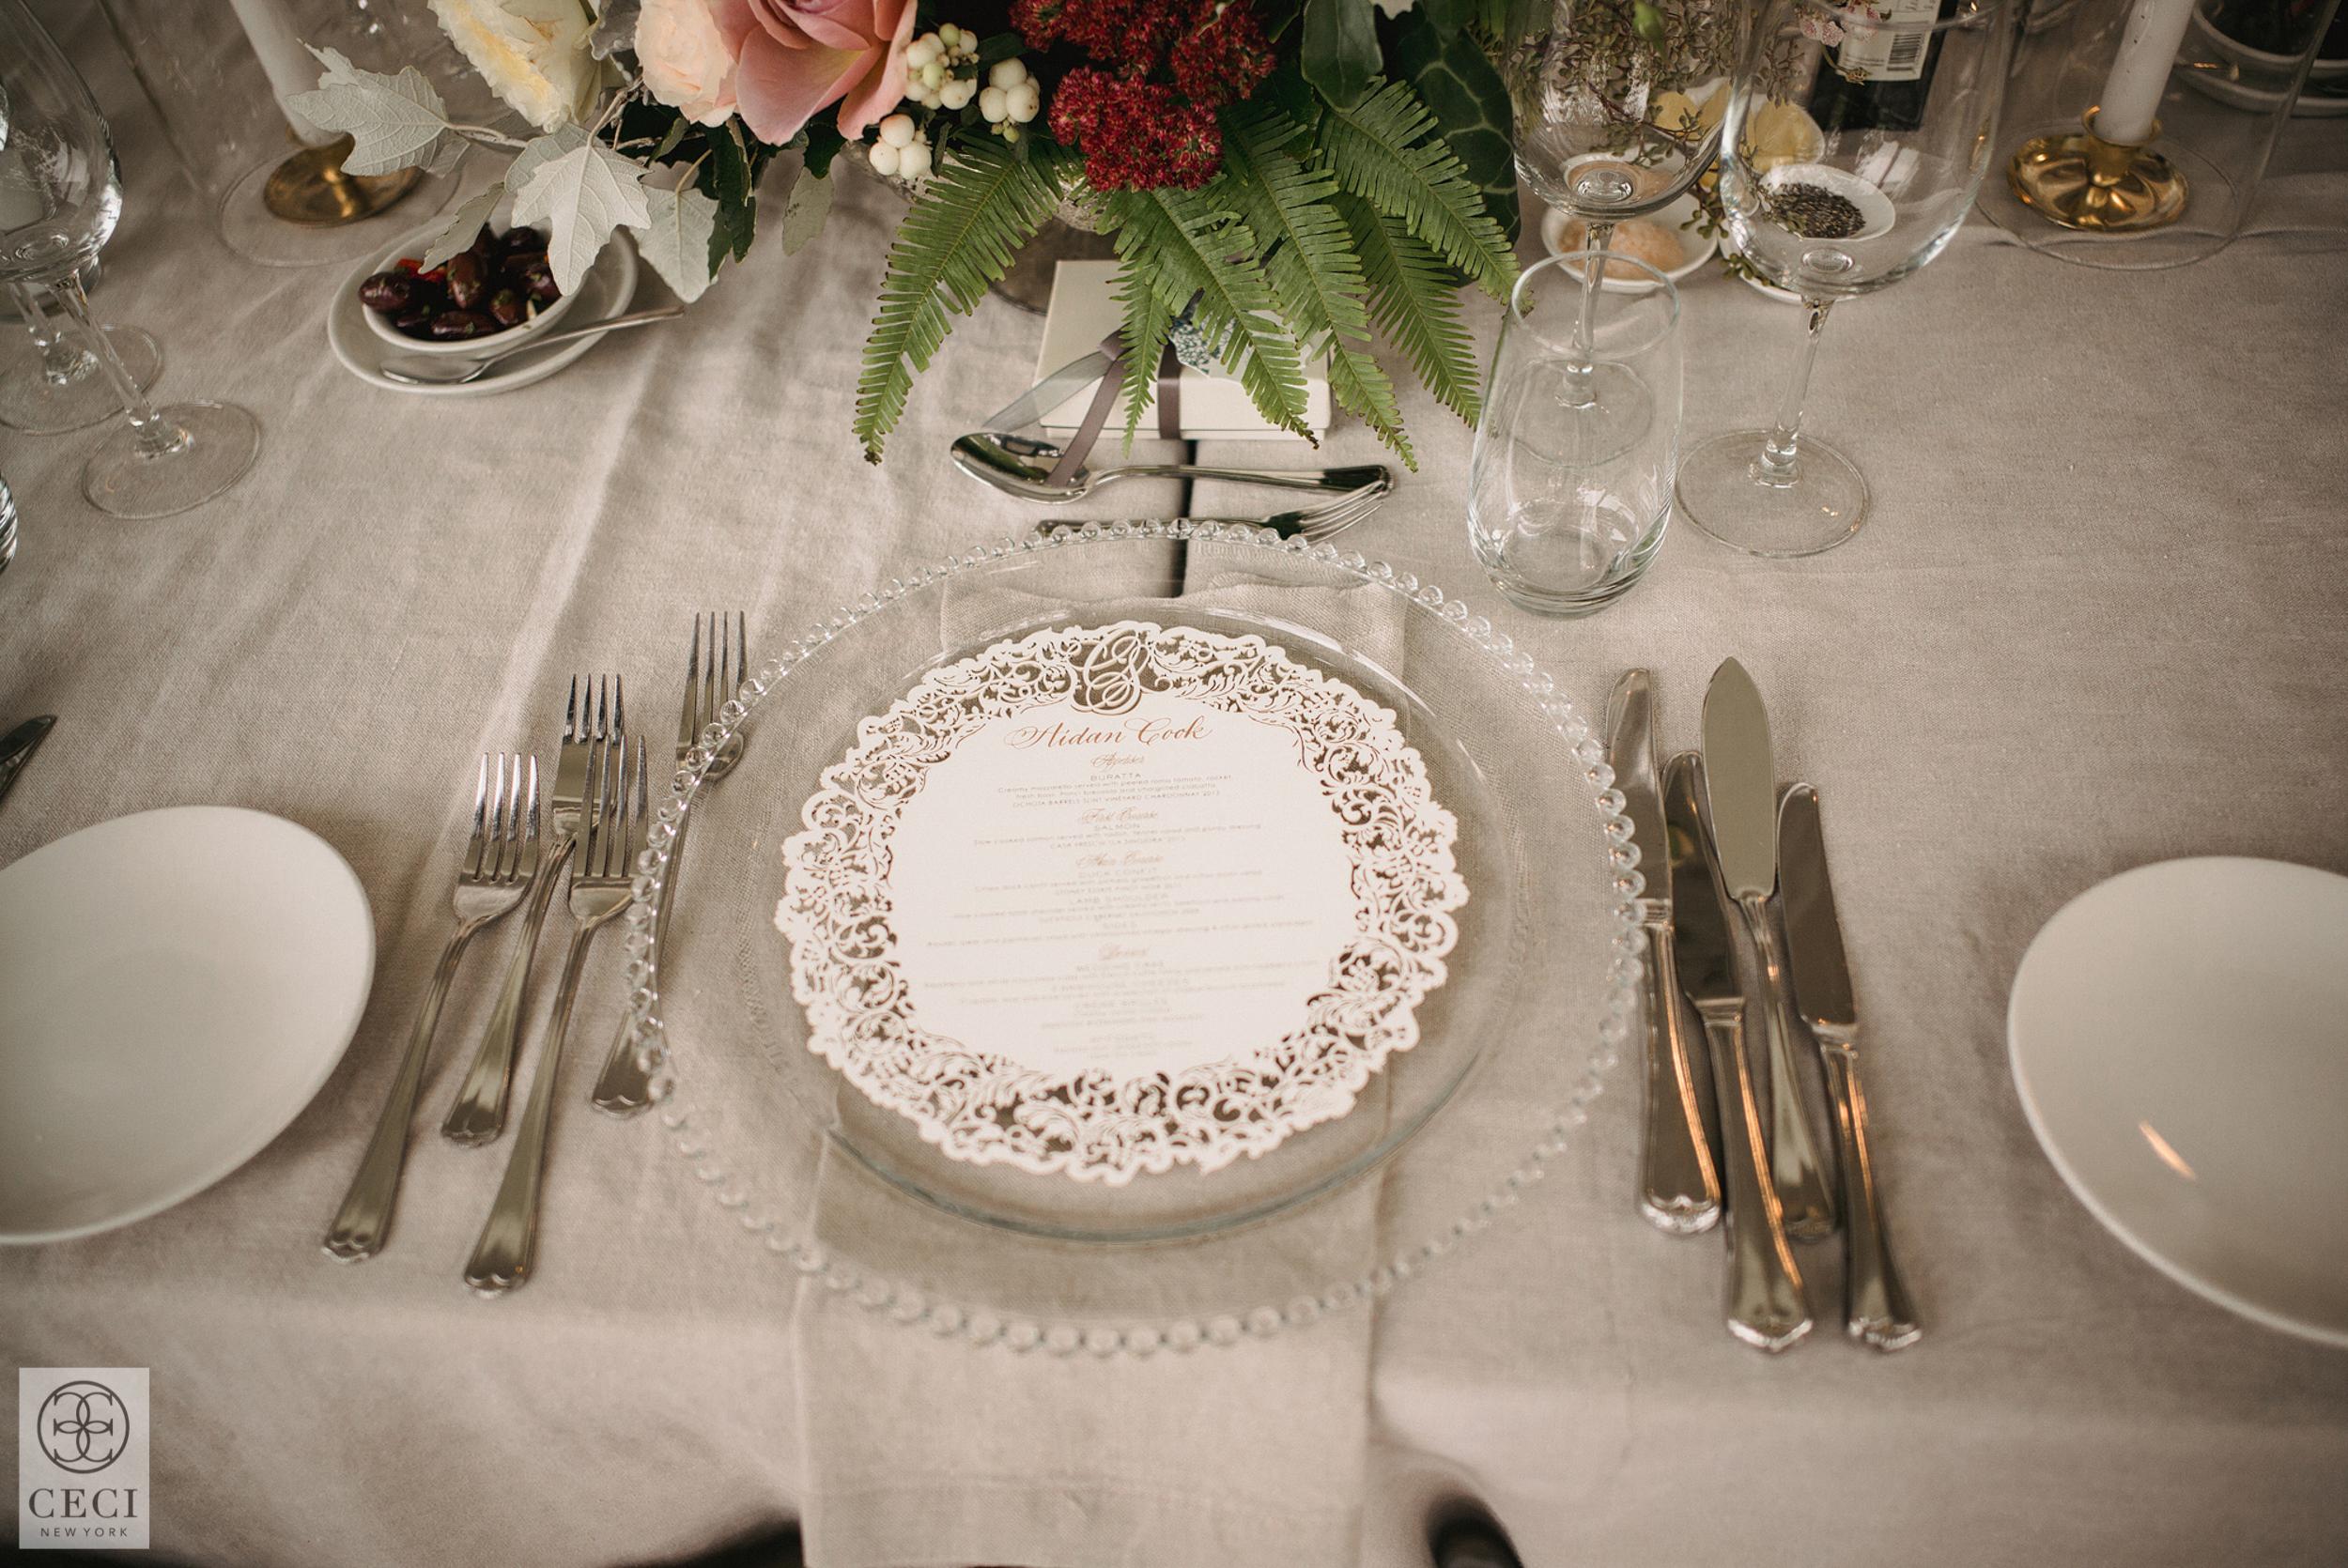 Ceci_New_York_Custom_Luxury_Wedding_BeautyShot_LaserCut_Stationery_Personalized_Couture_Foil_Stamping_Perth_Destination_Australia_Chic_-13.jpg